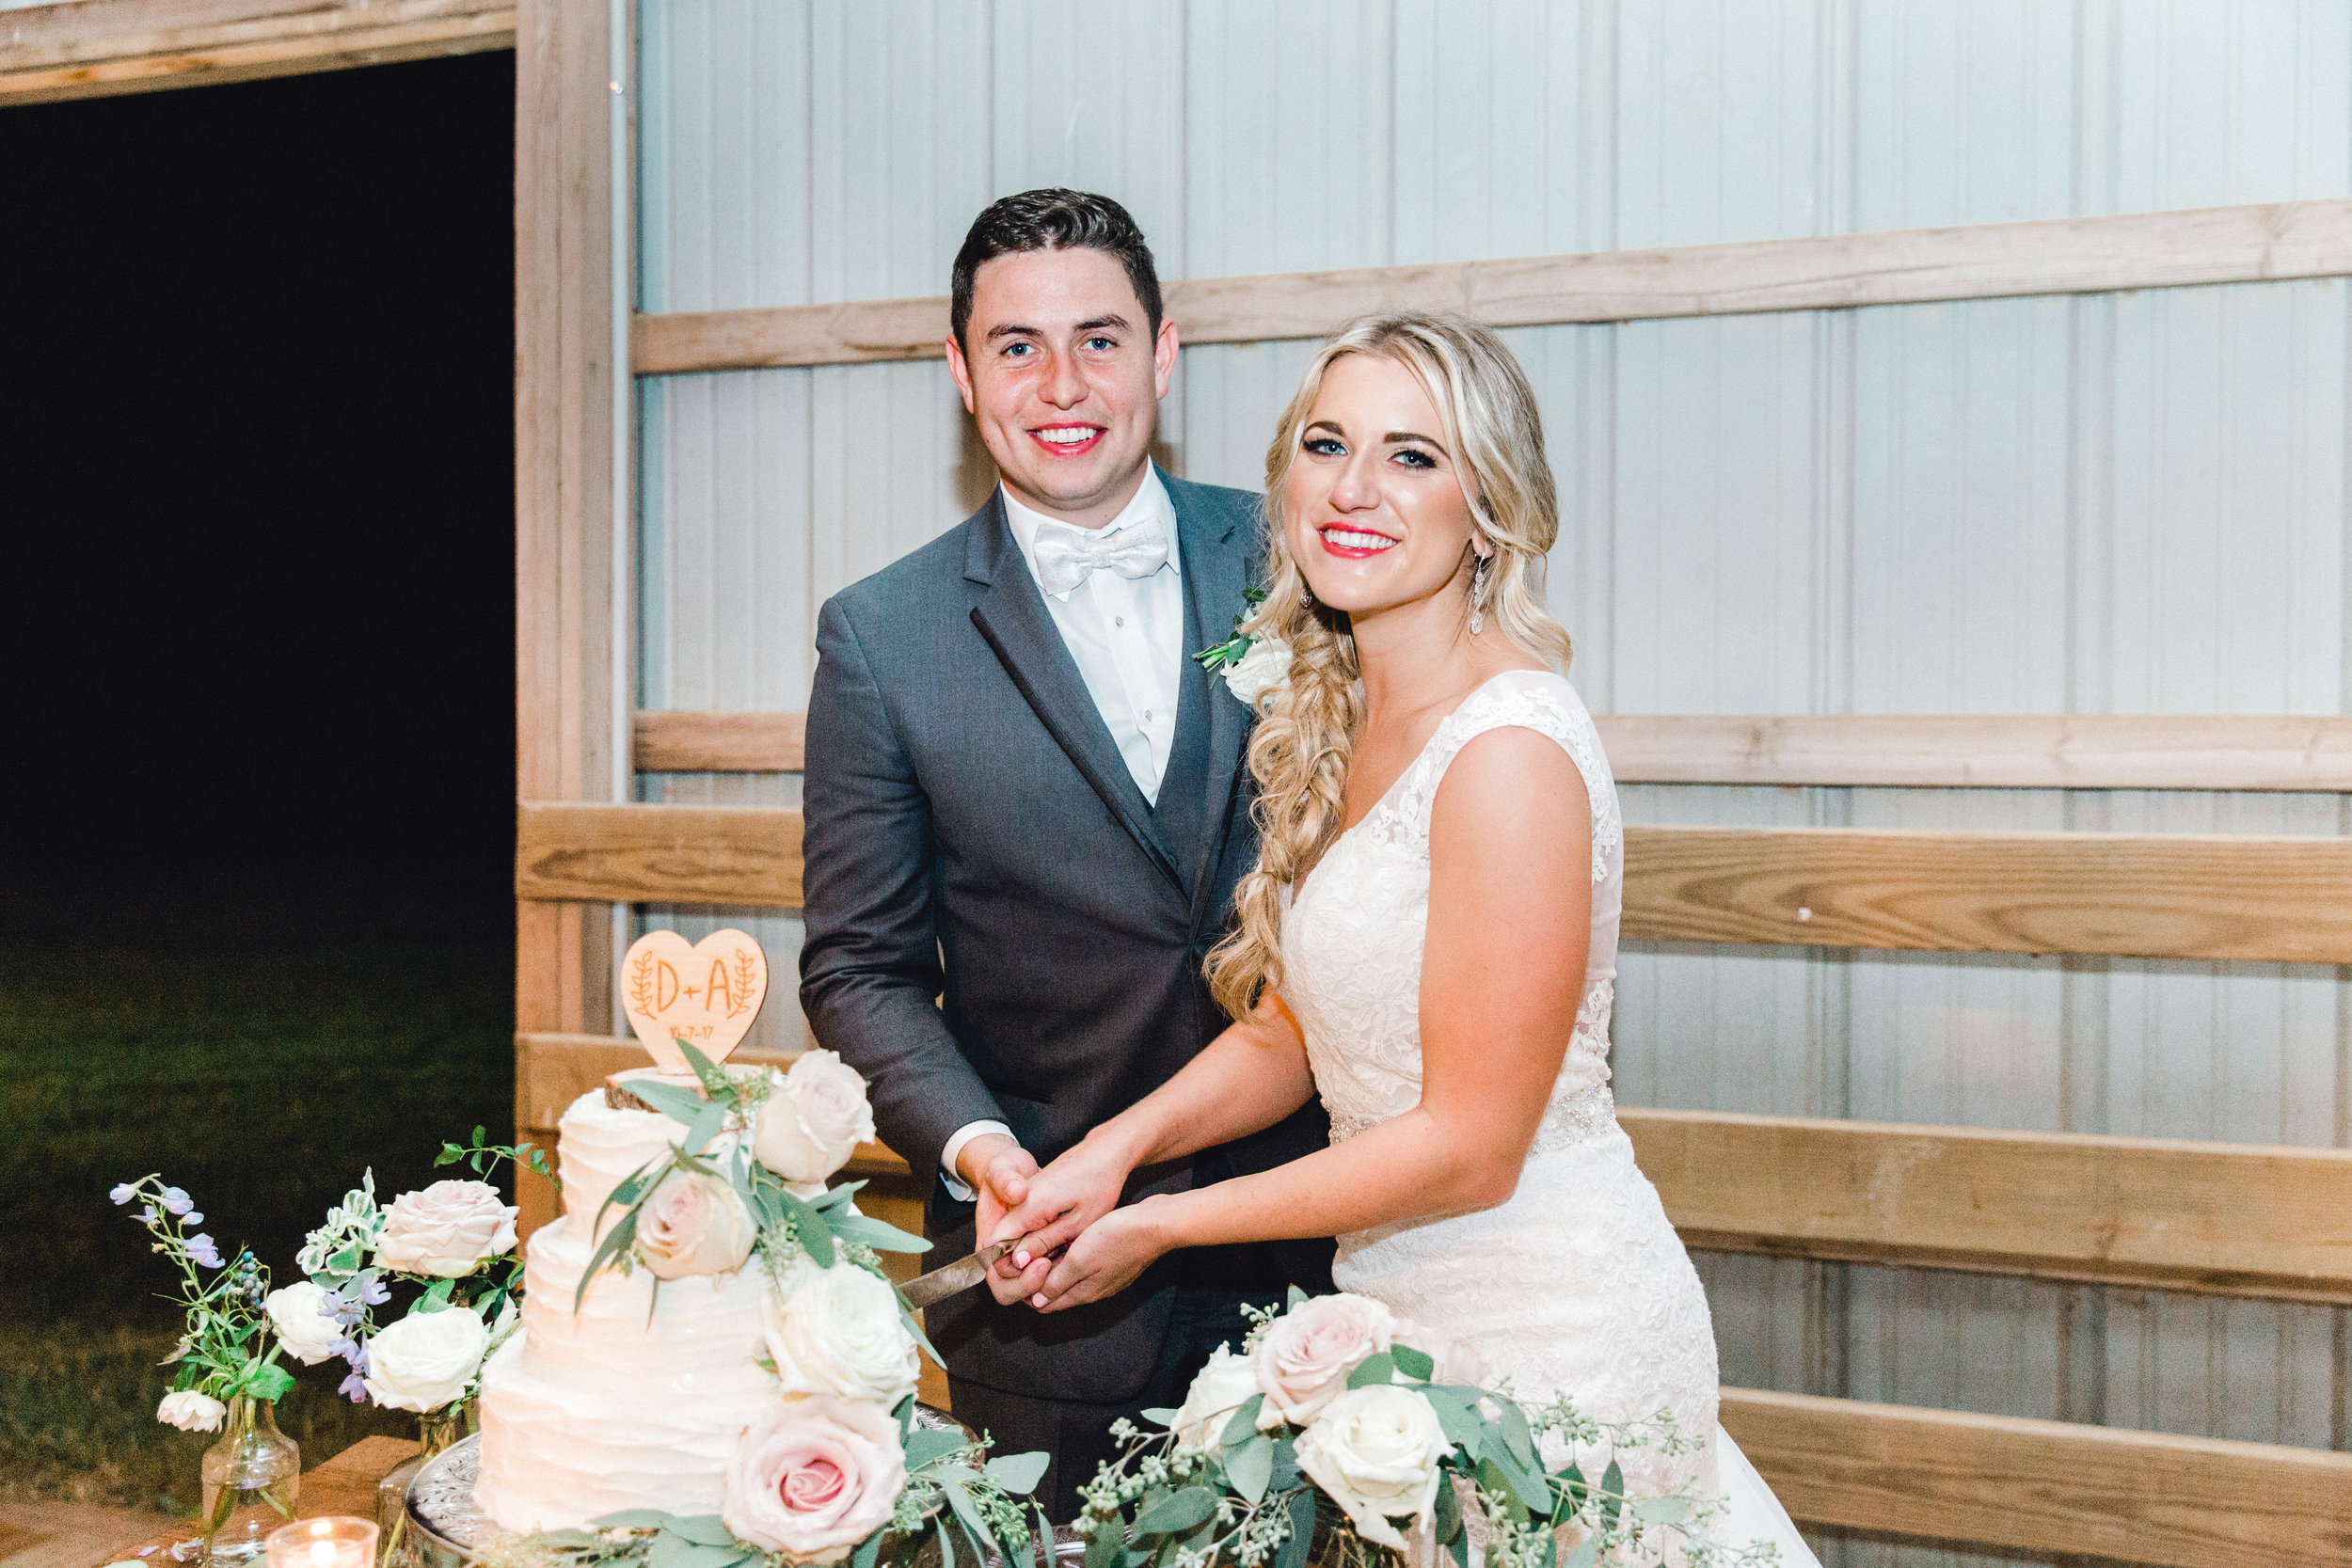 Paige-Mercer-Photography-Florida-Wedding-Photographer-Alyssa&Drew-88.jpg